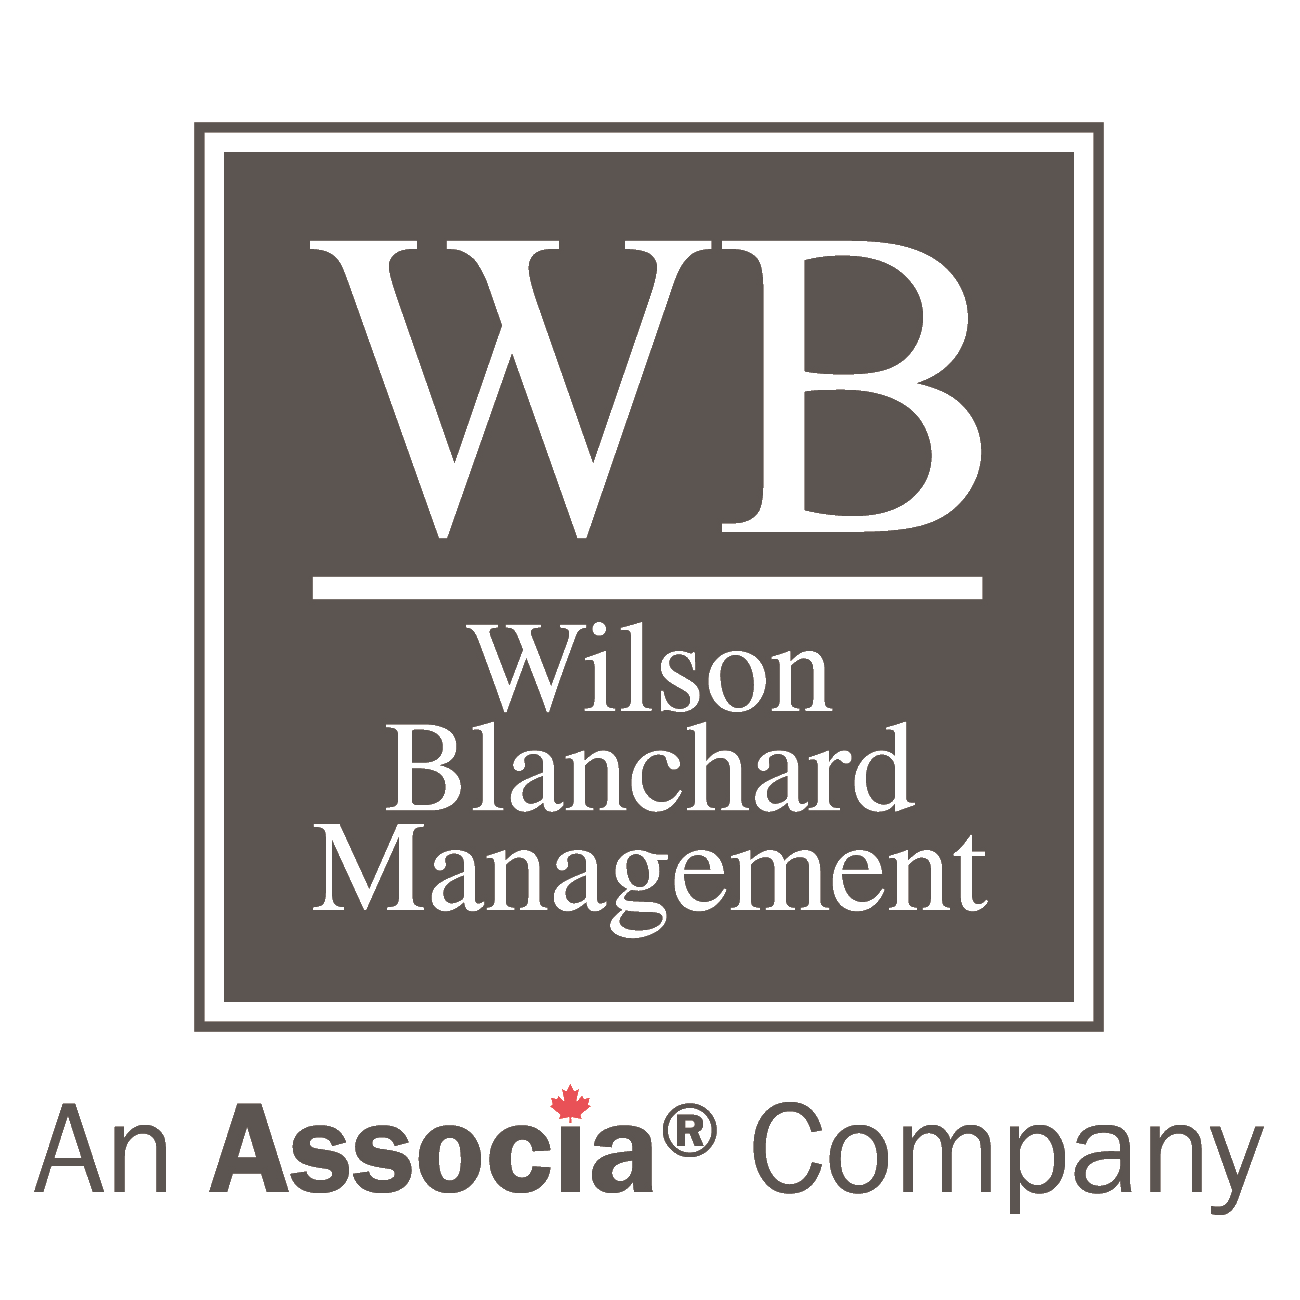 Wilson, Blanchard Management Inc. logo